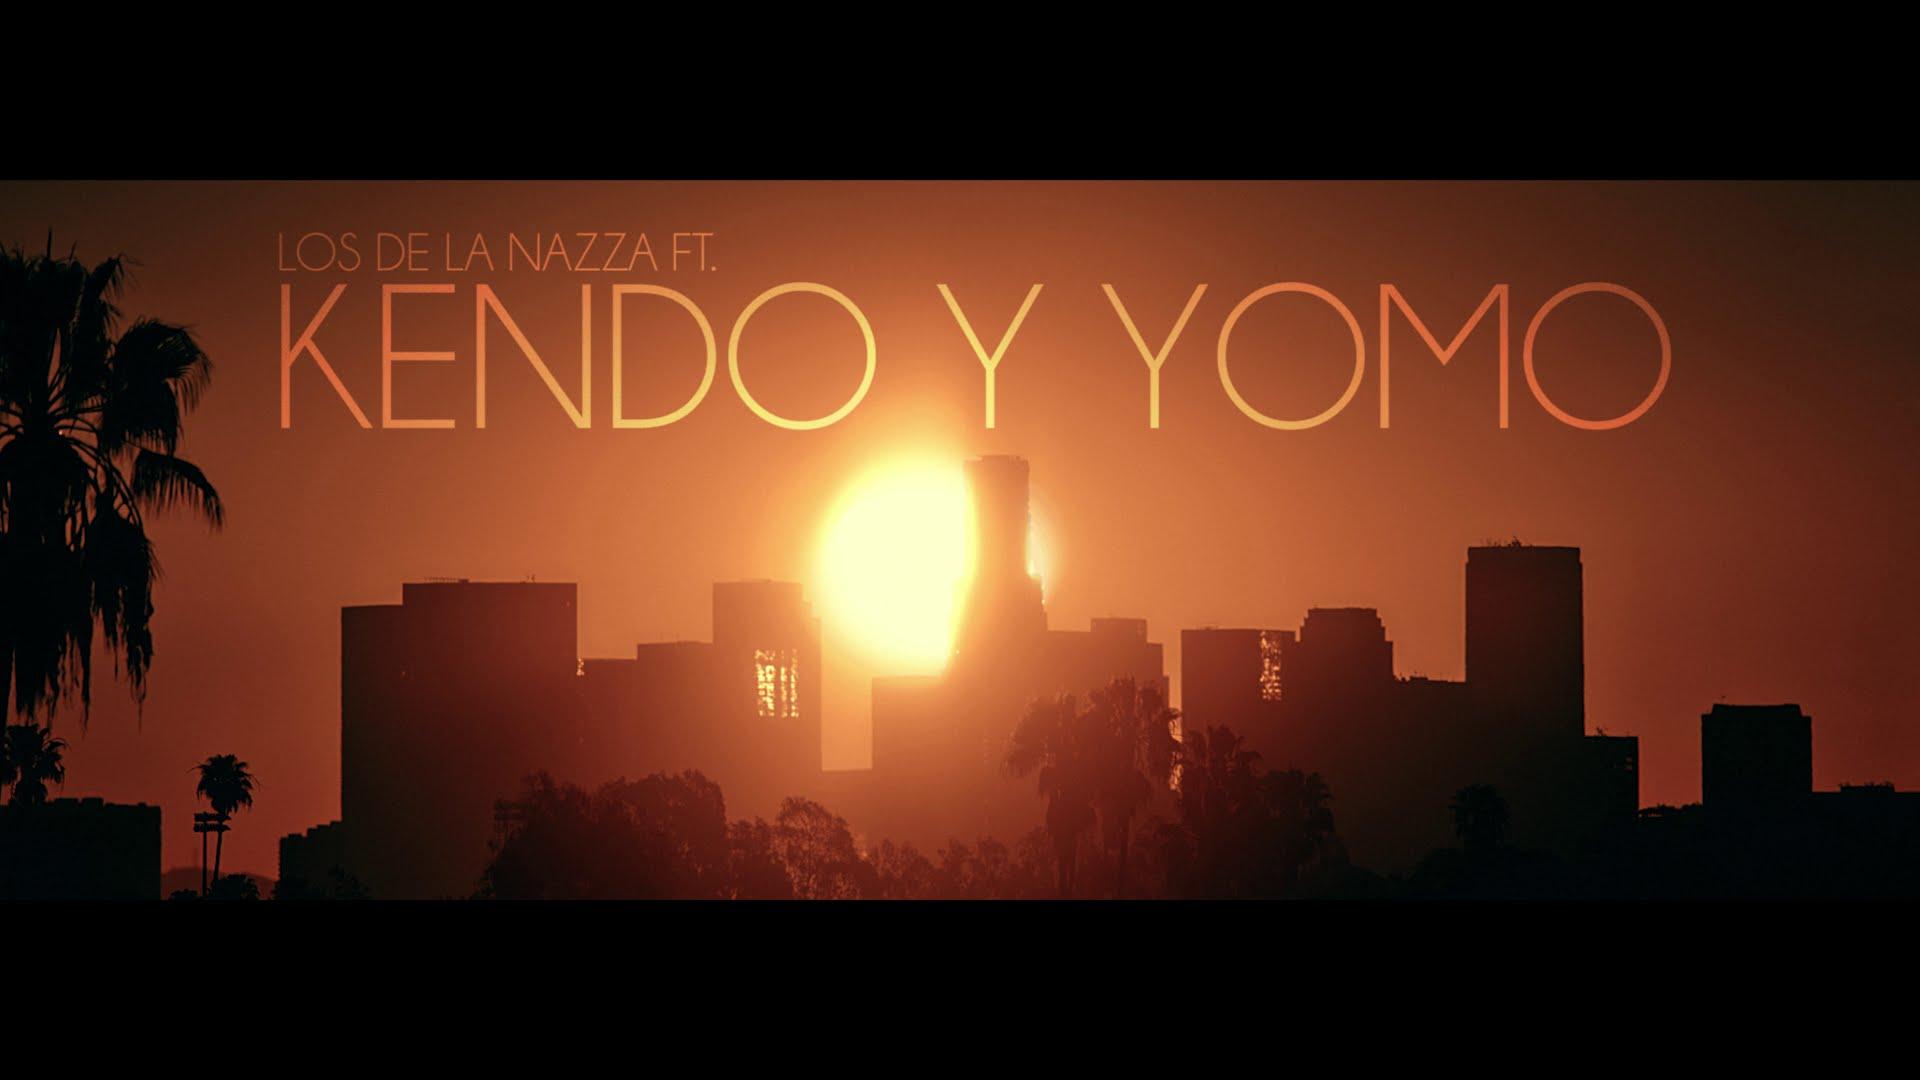 Kendo Kaponi Ft Yomo – Noche Fria (Official Video)